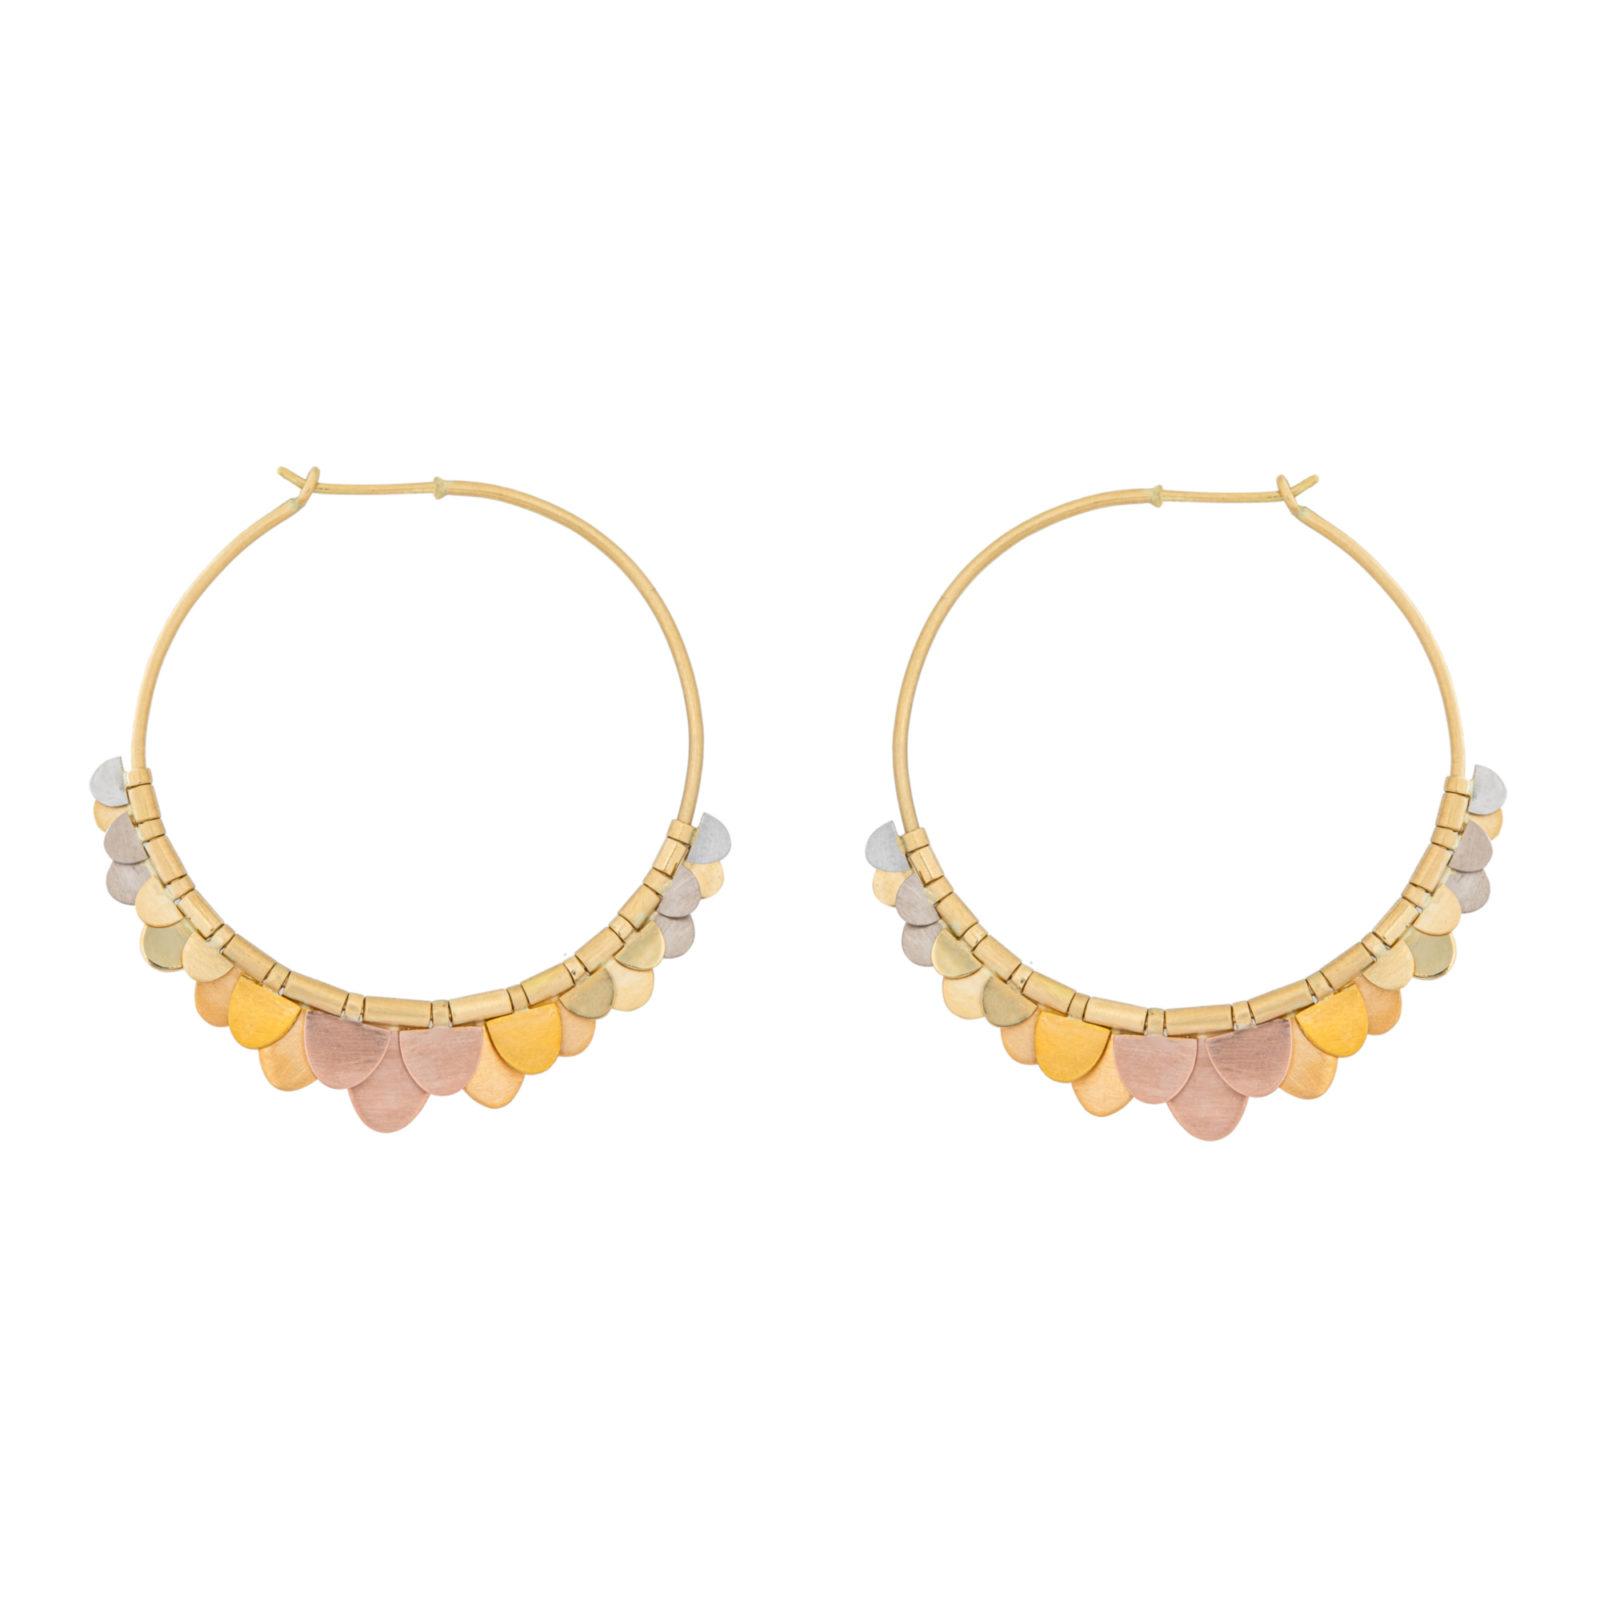 Sia Taylor FE8 RAIN Rainbow Gold Earrings WB